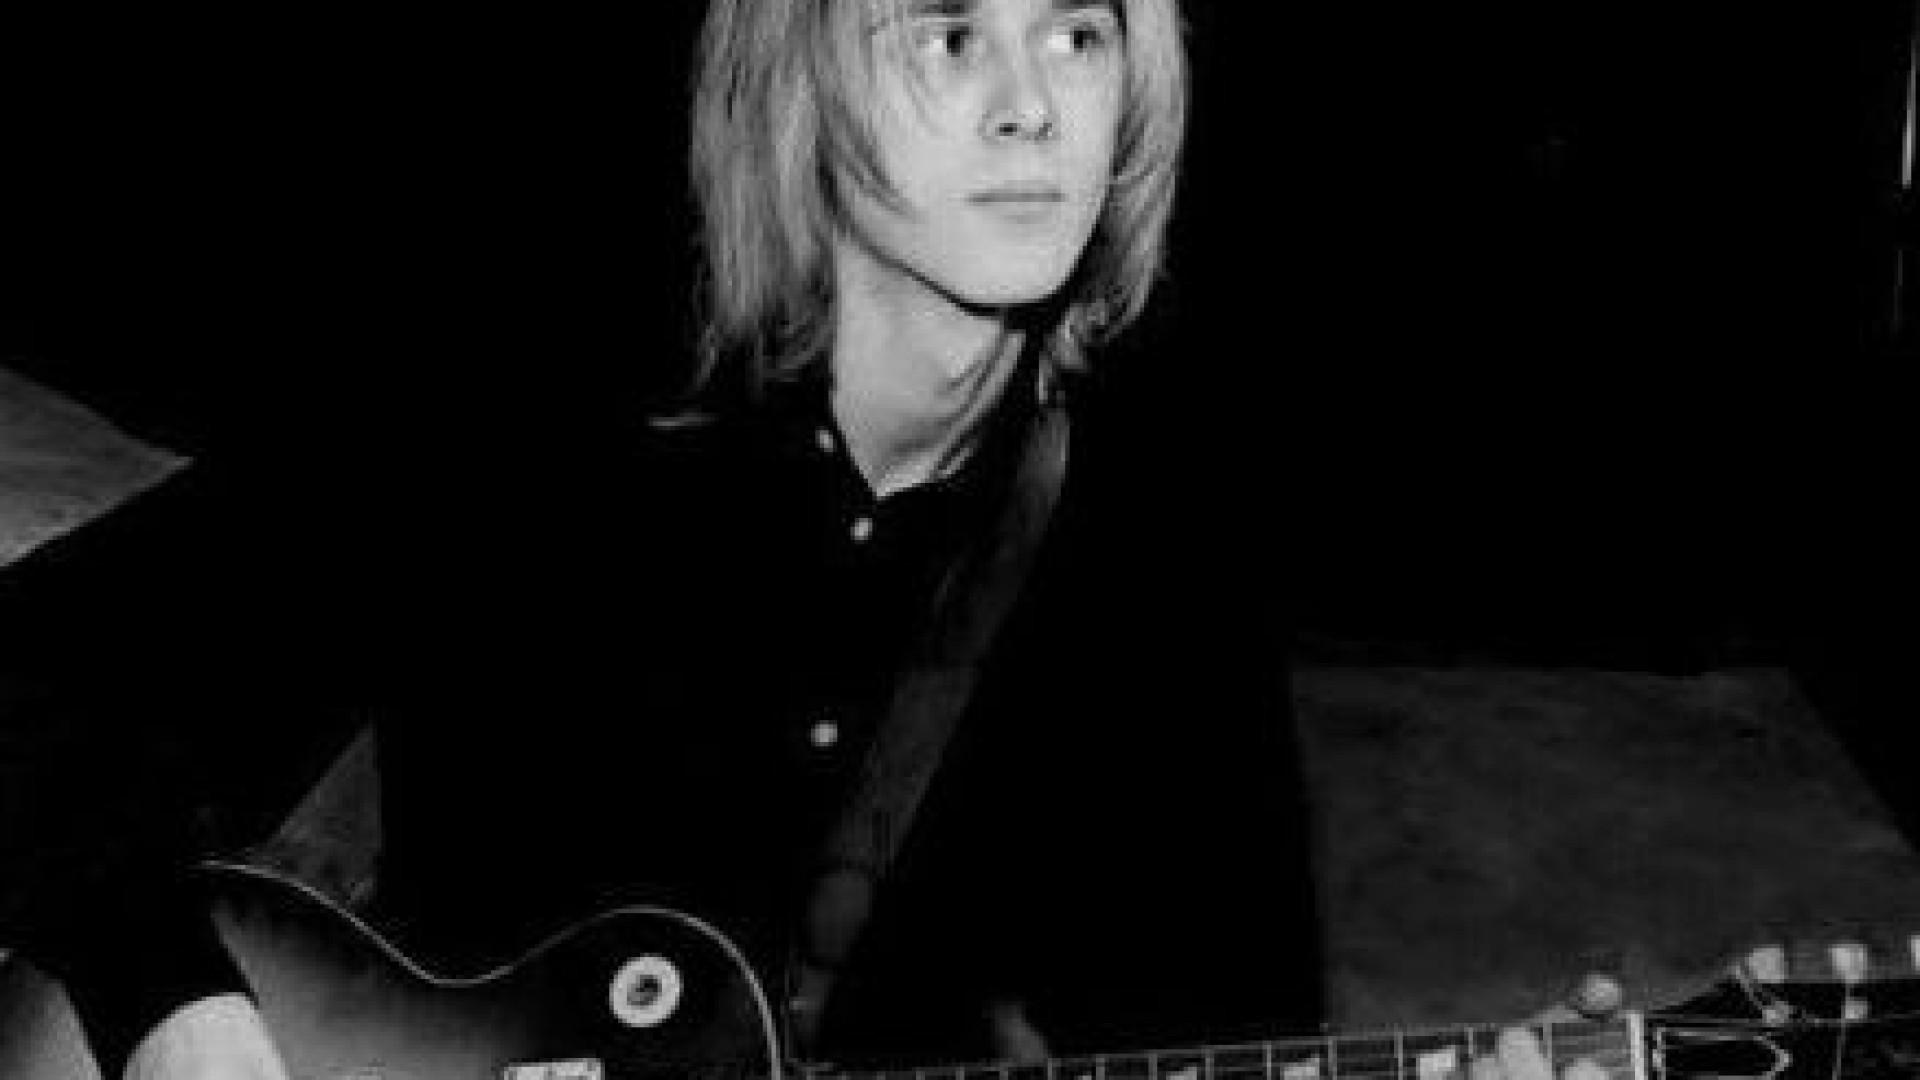 Morreu Danny Kirwan, guitarrista dos Fleetwood Mac. Tinha 68 anos